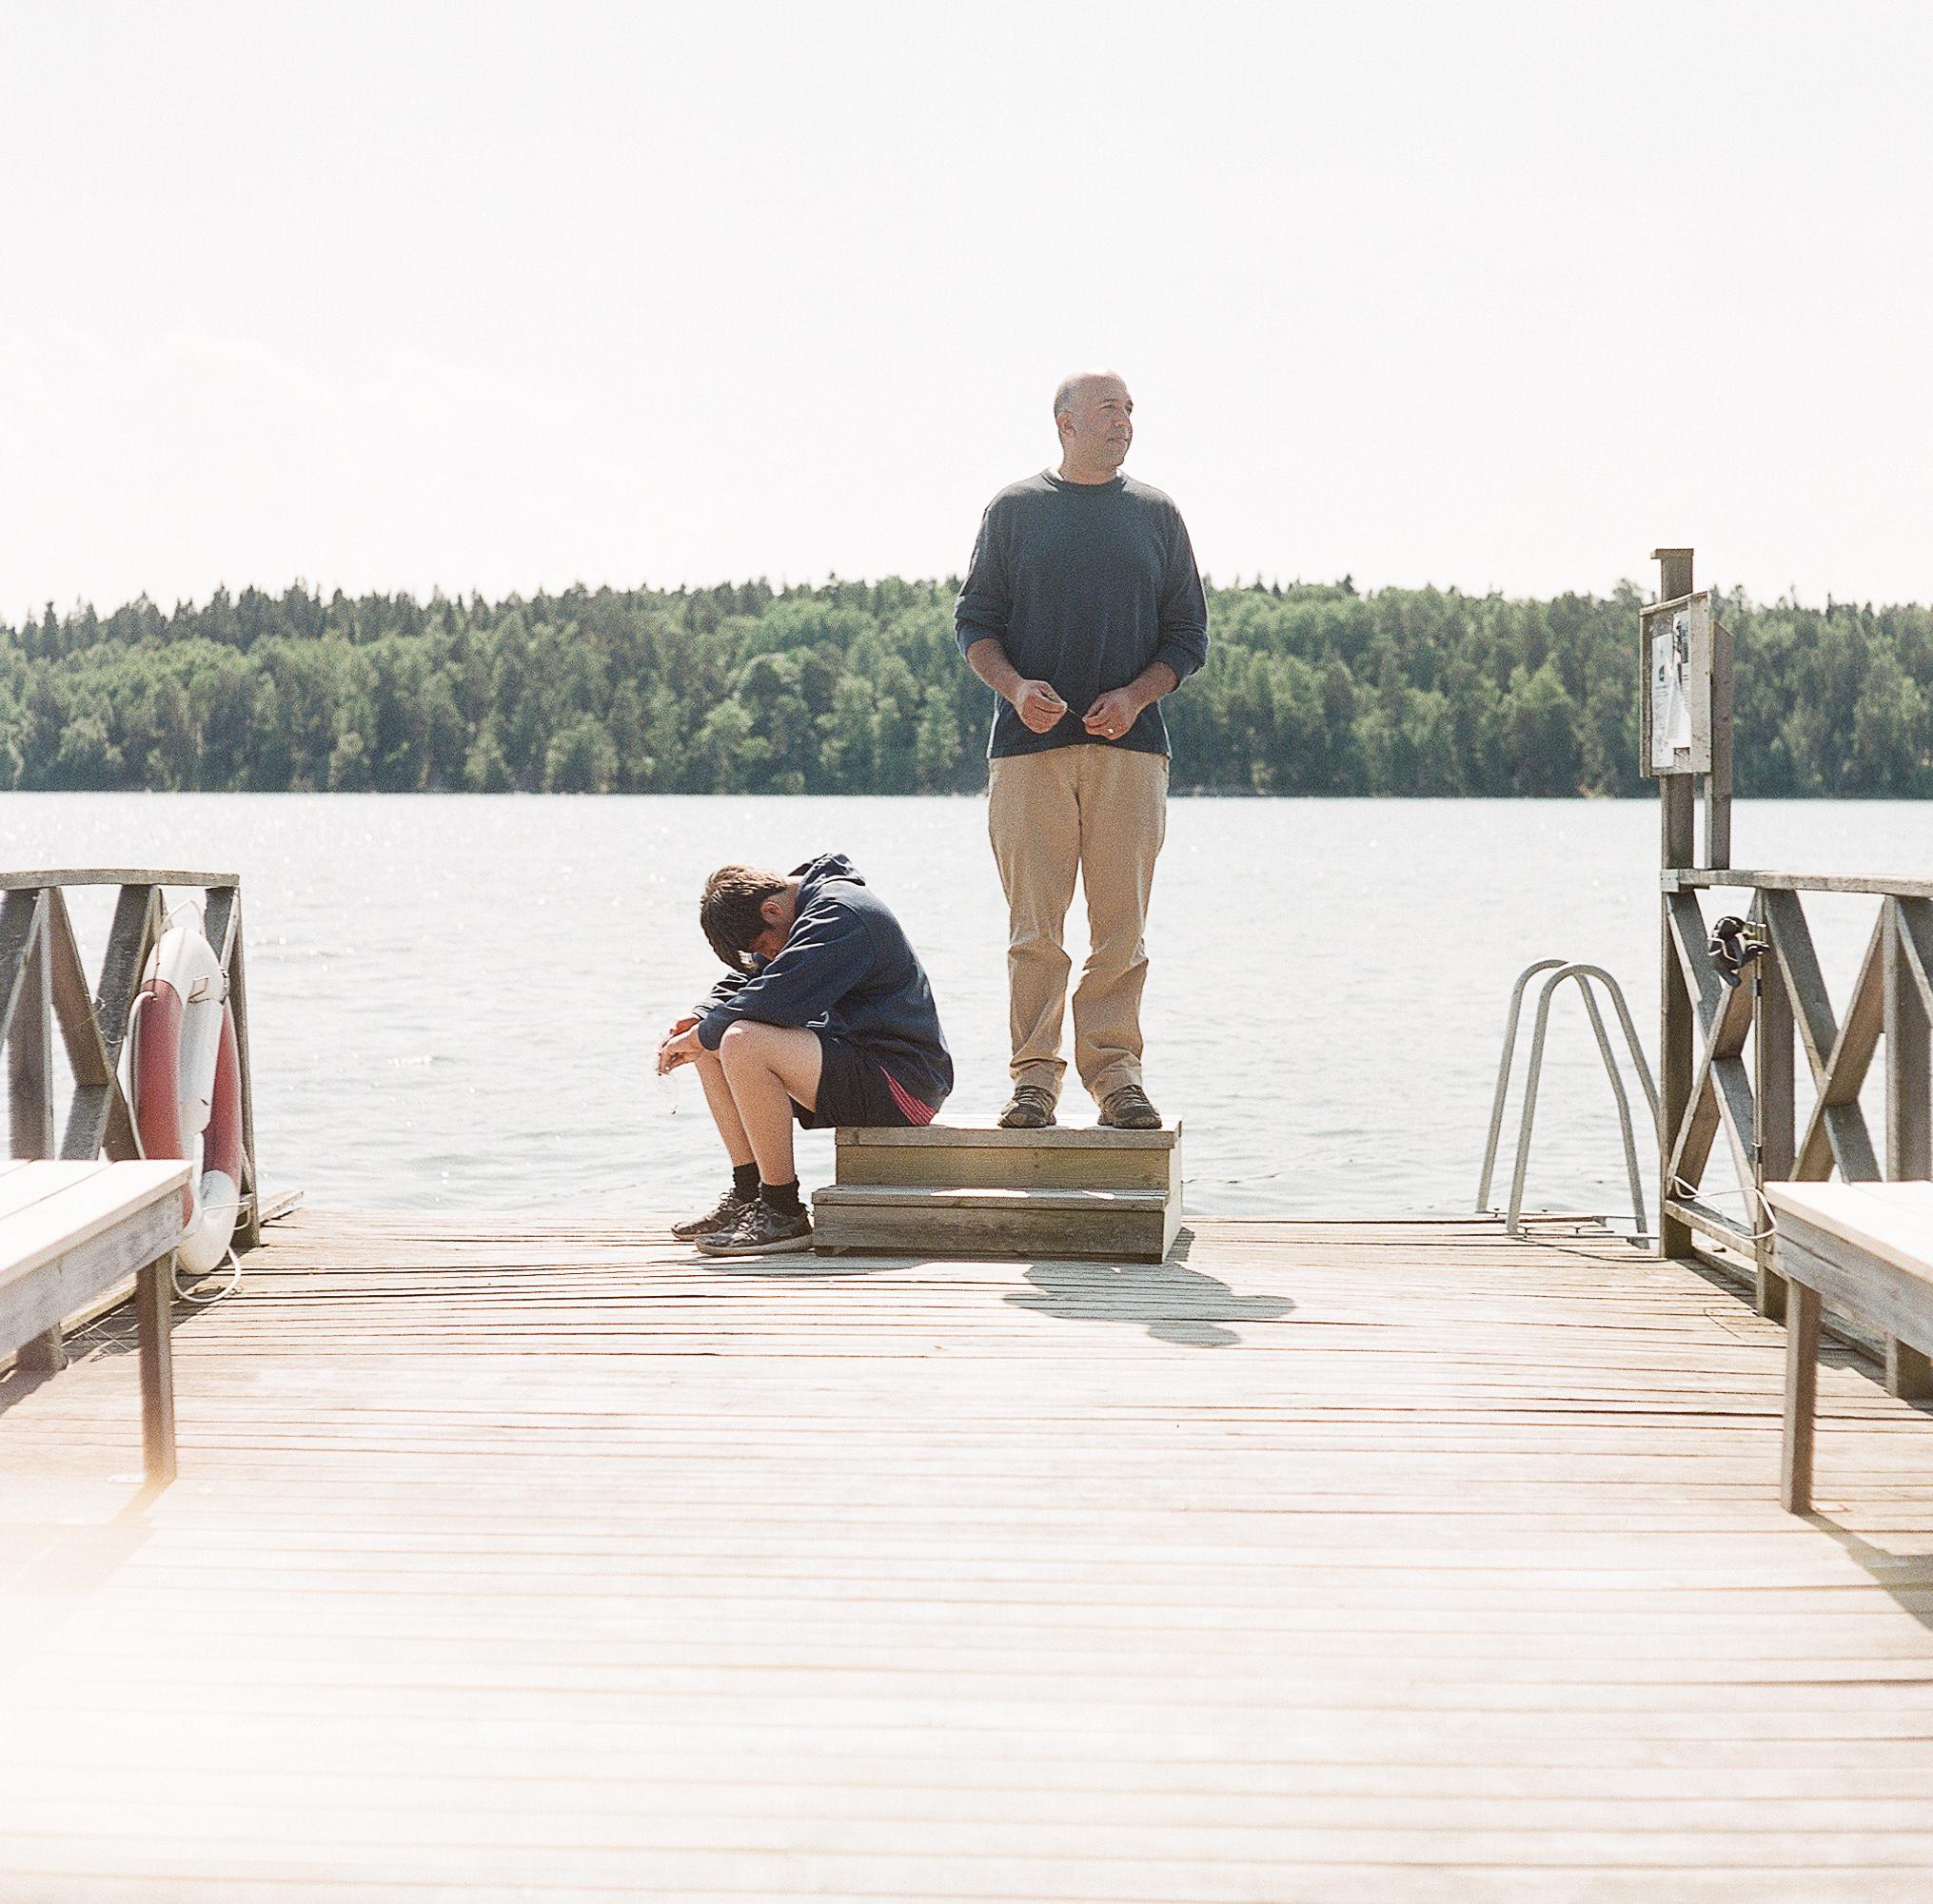 Tranholmen, Sweden